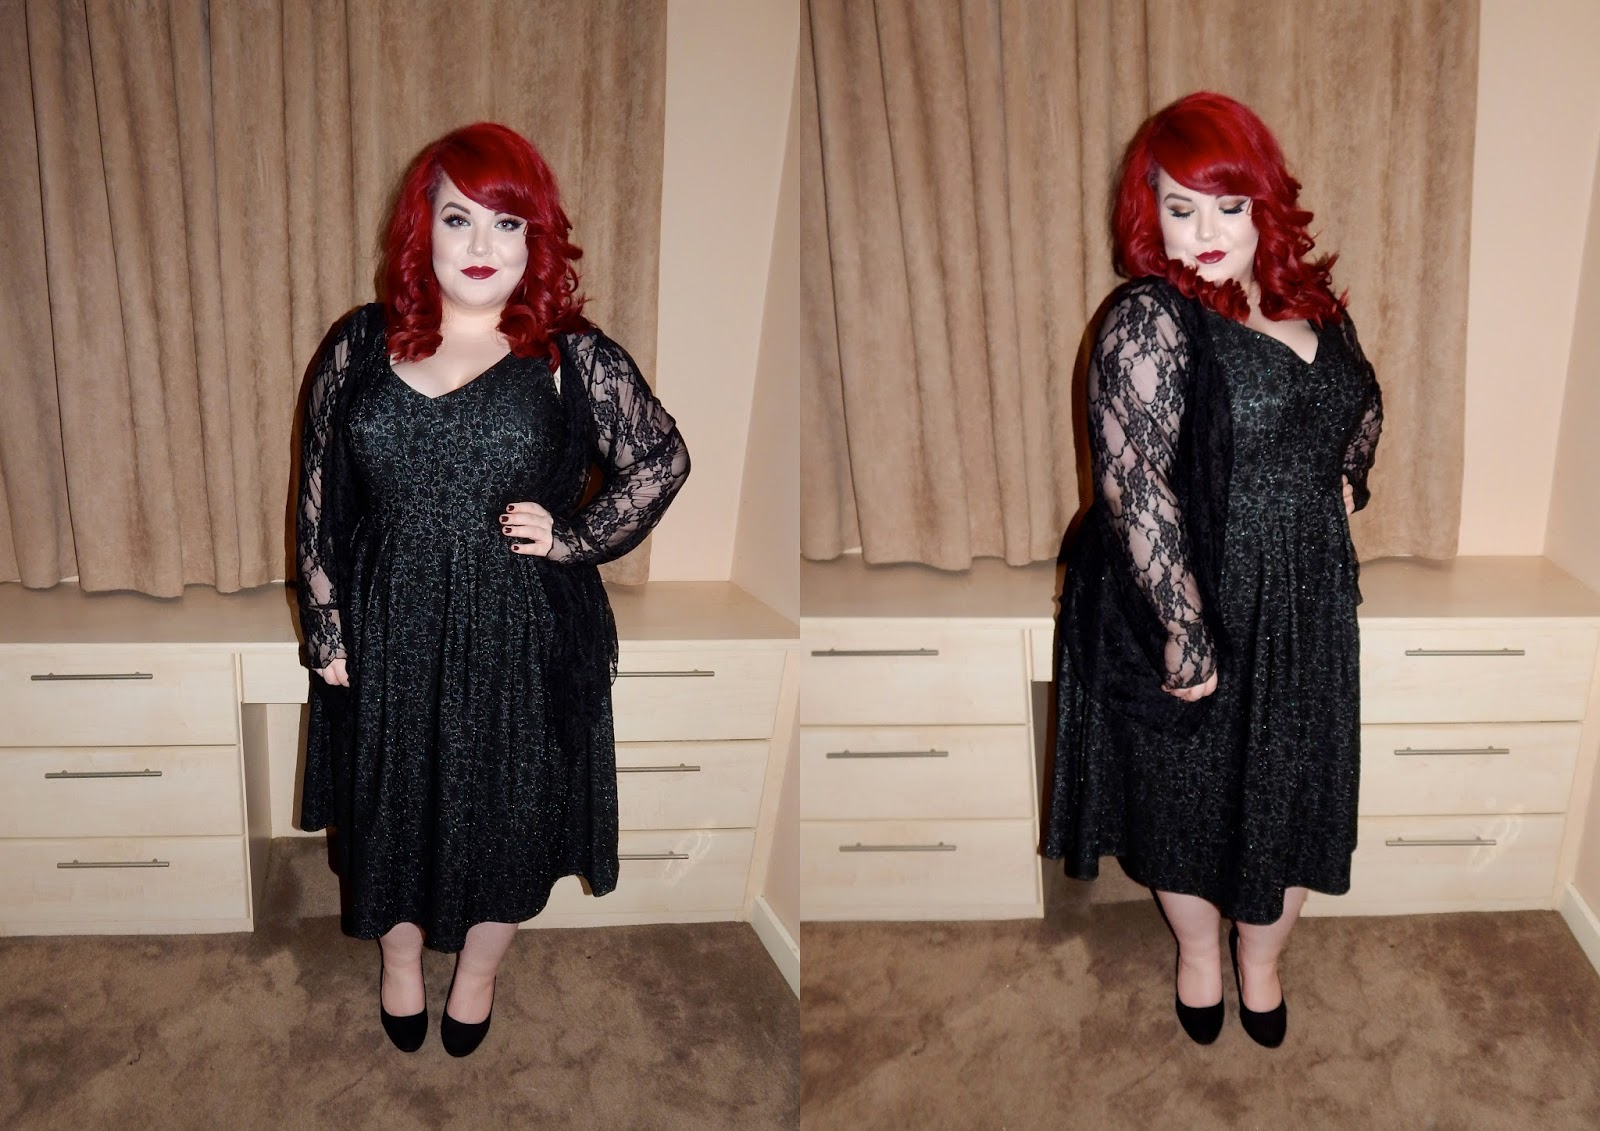 Kelly brooke dress, celeblook cardigan, plus size blogger